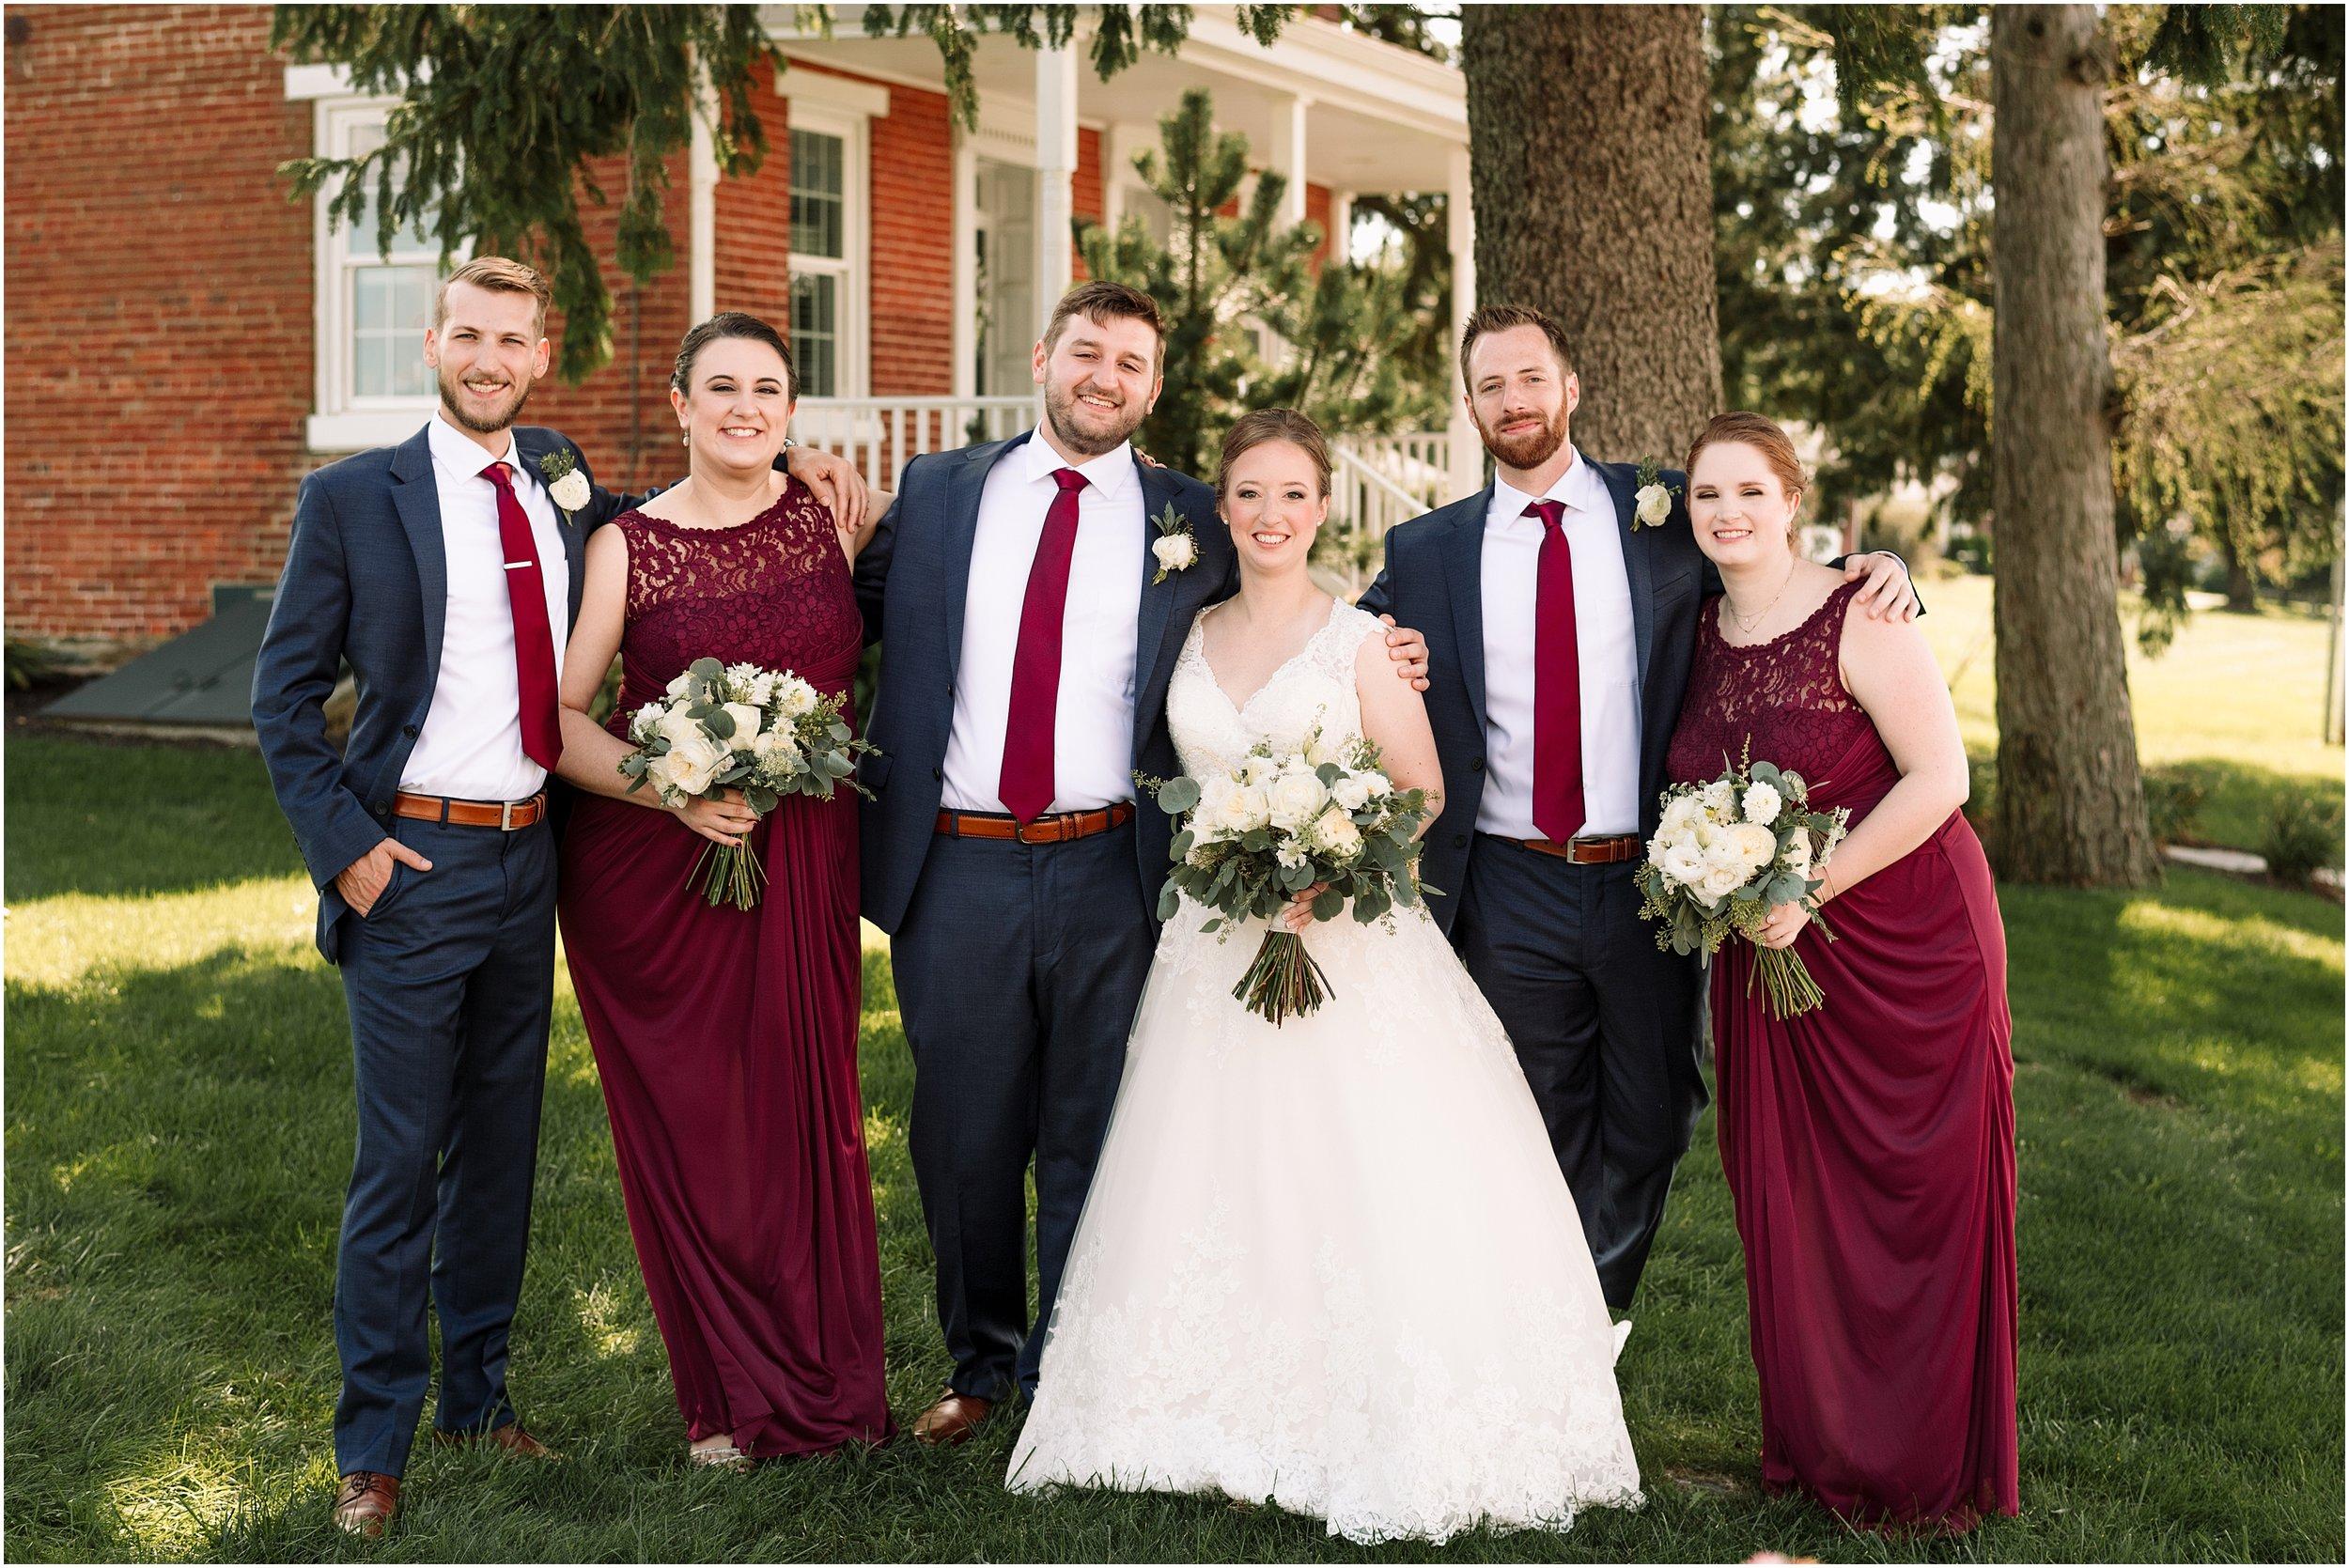 hannah leigh photography Wyndridge Farm Wedding York PA_1516.jpg